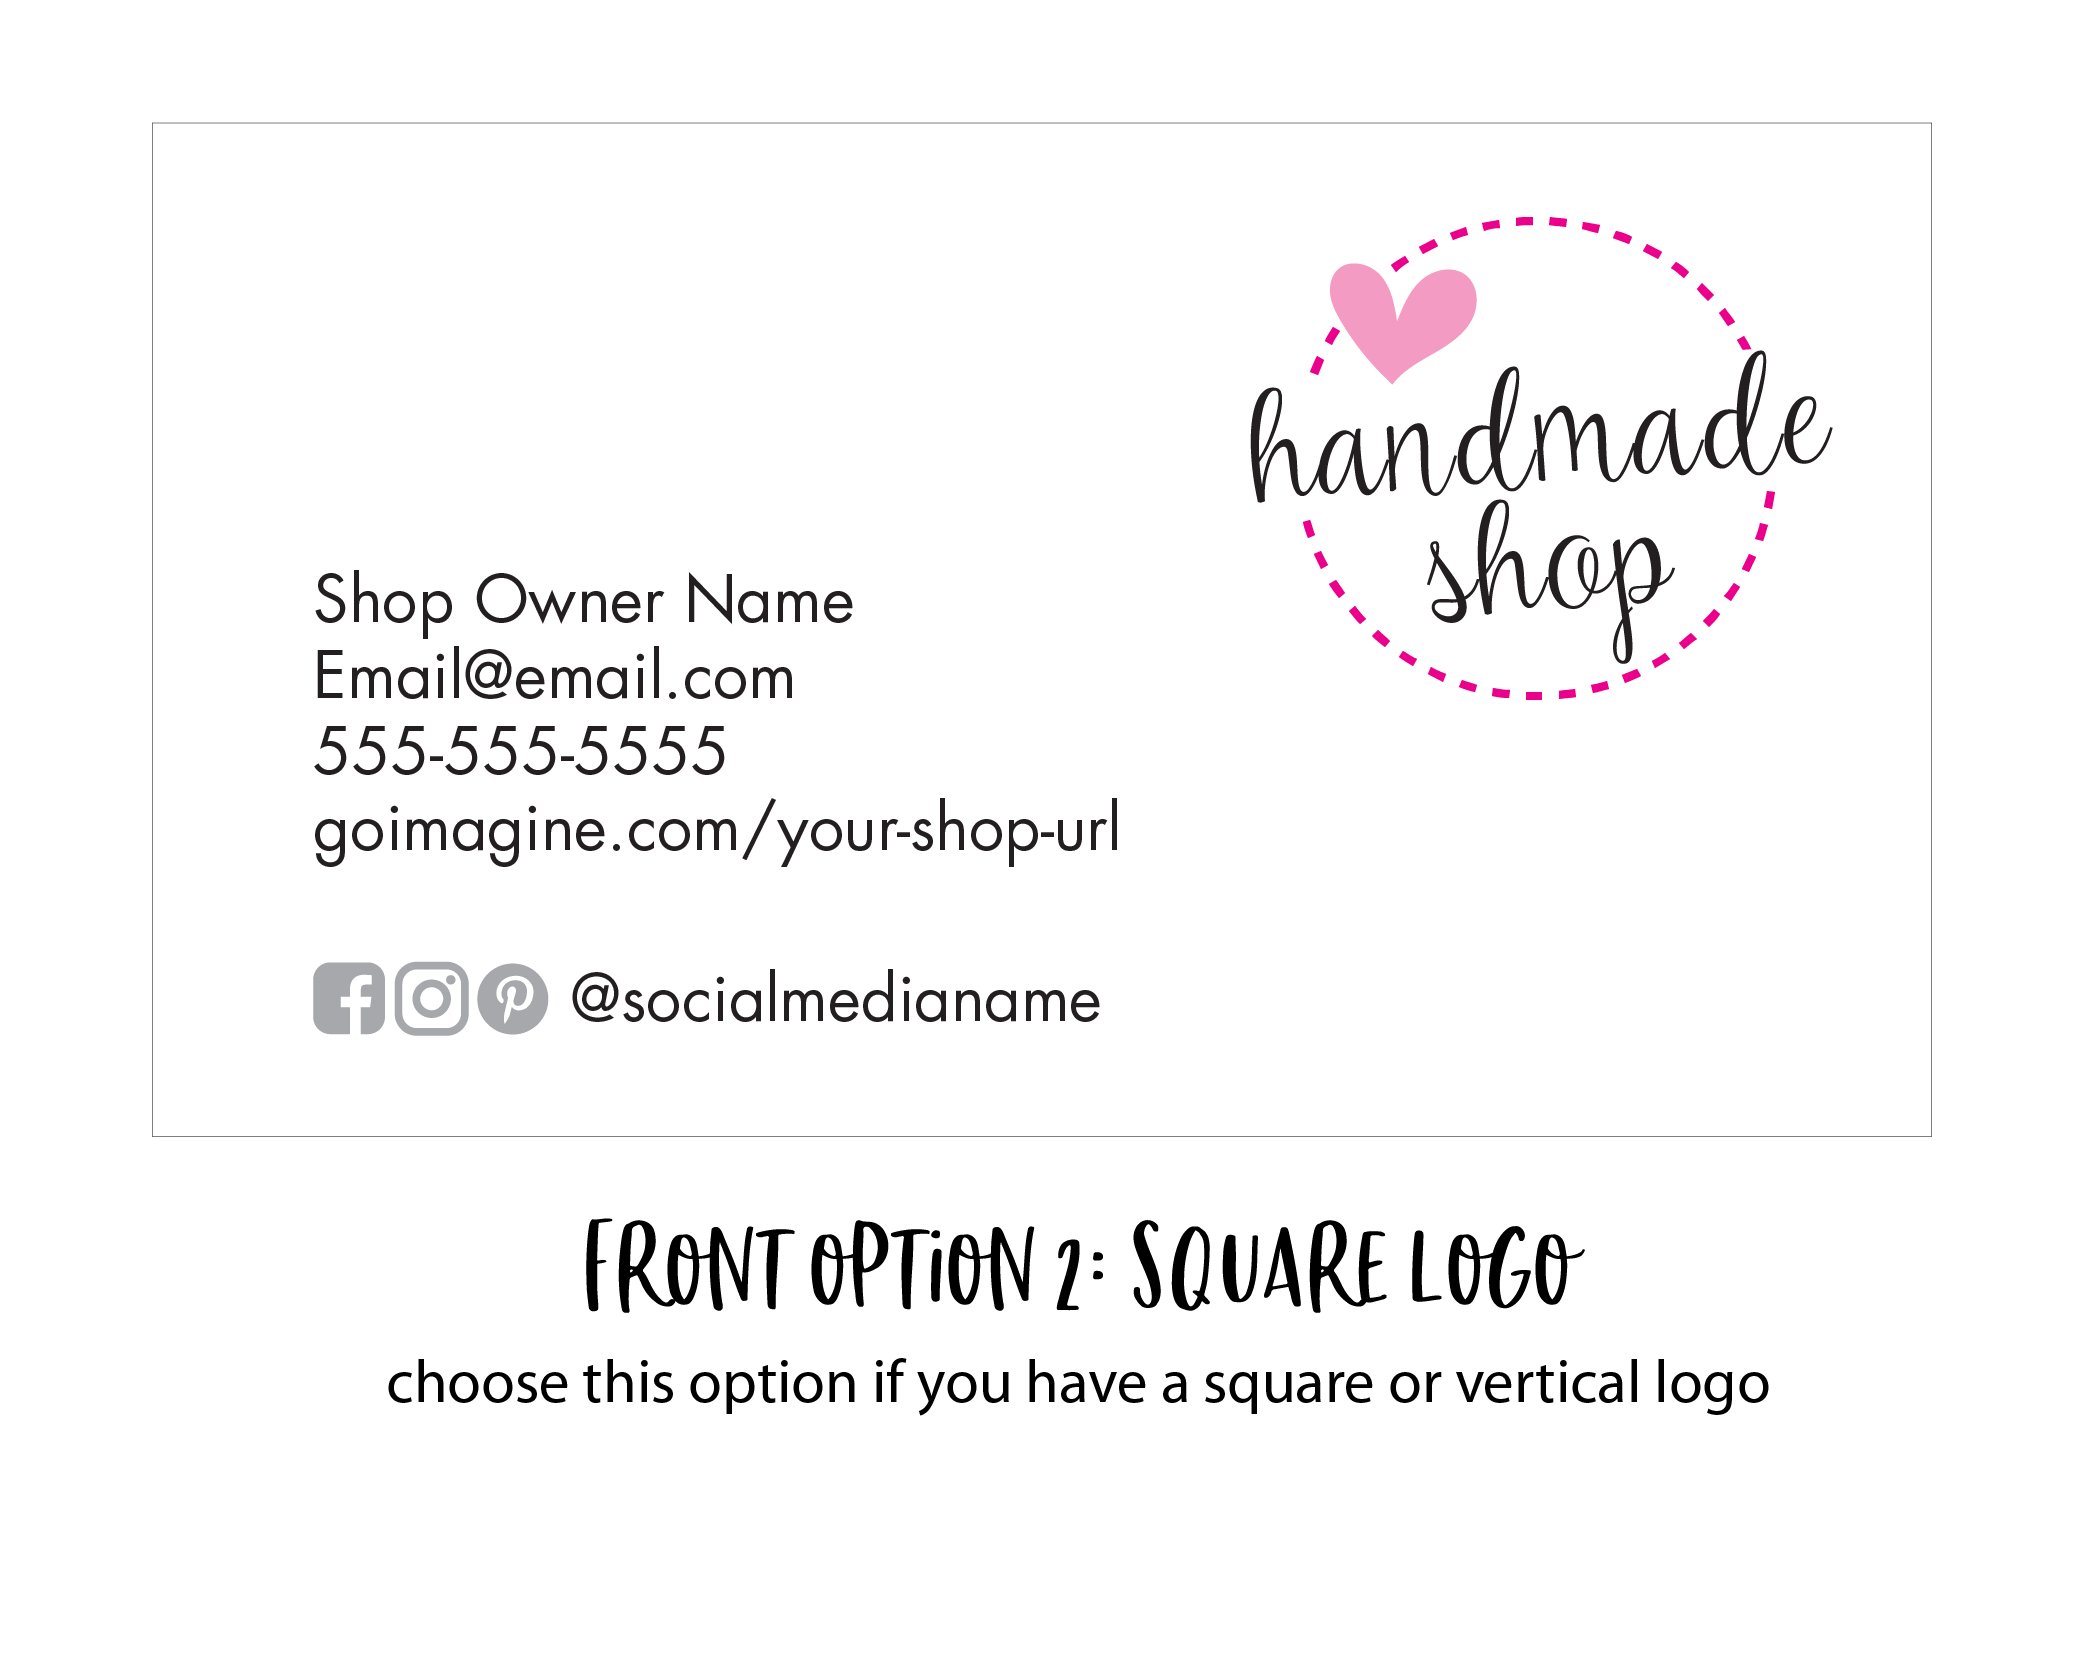 custom business card - square logo format